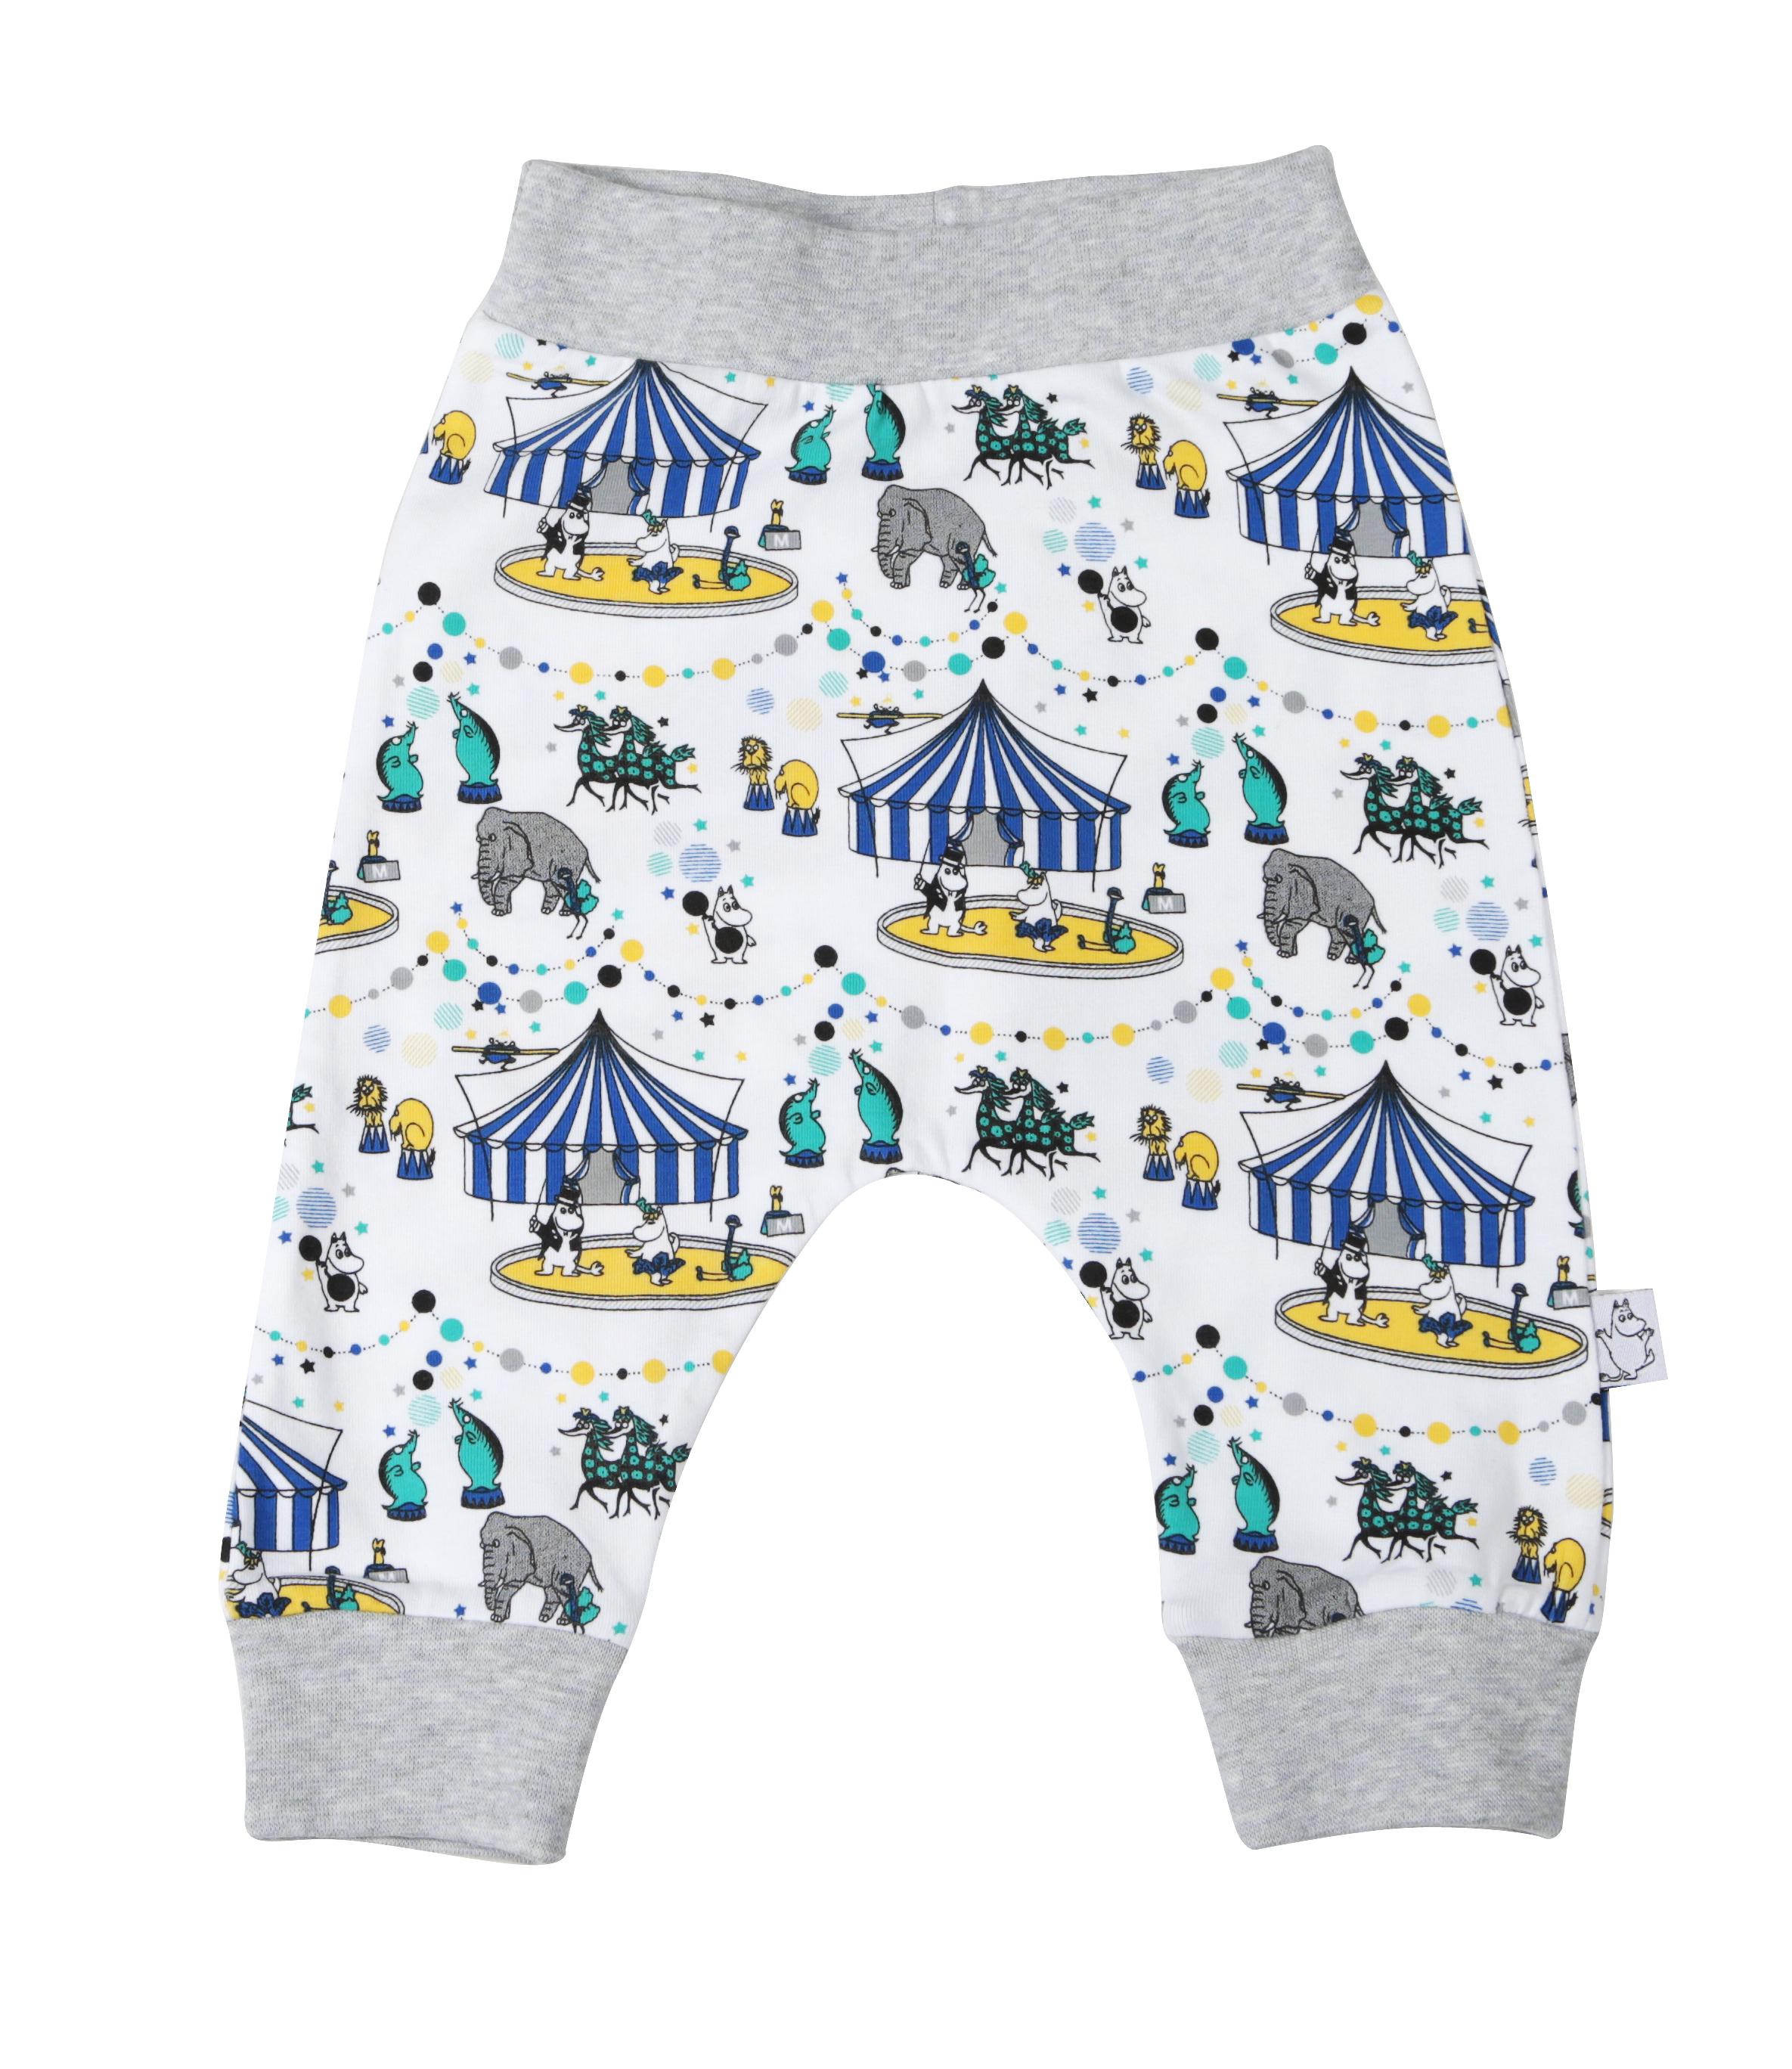 Martinex Circus baby pants white/blue